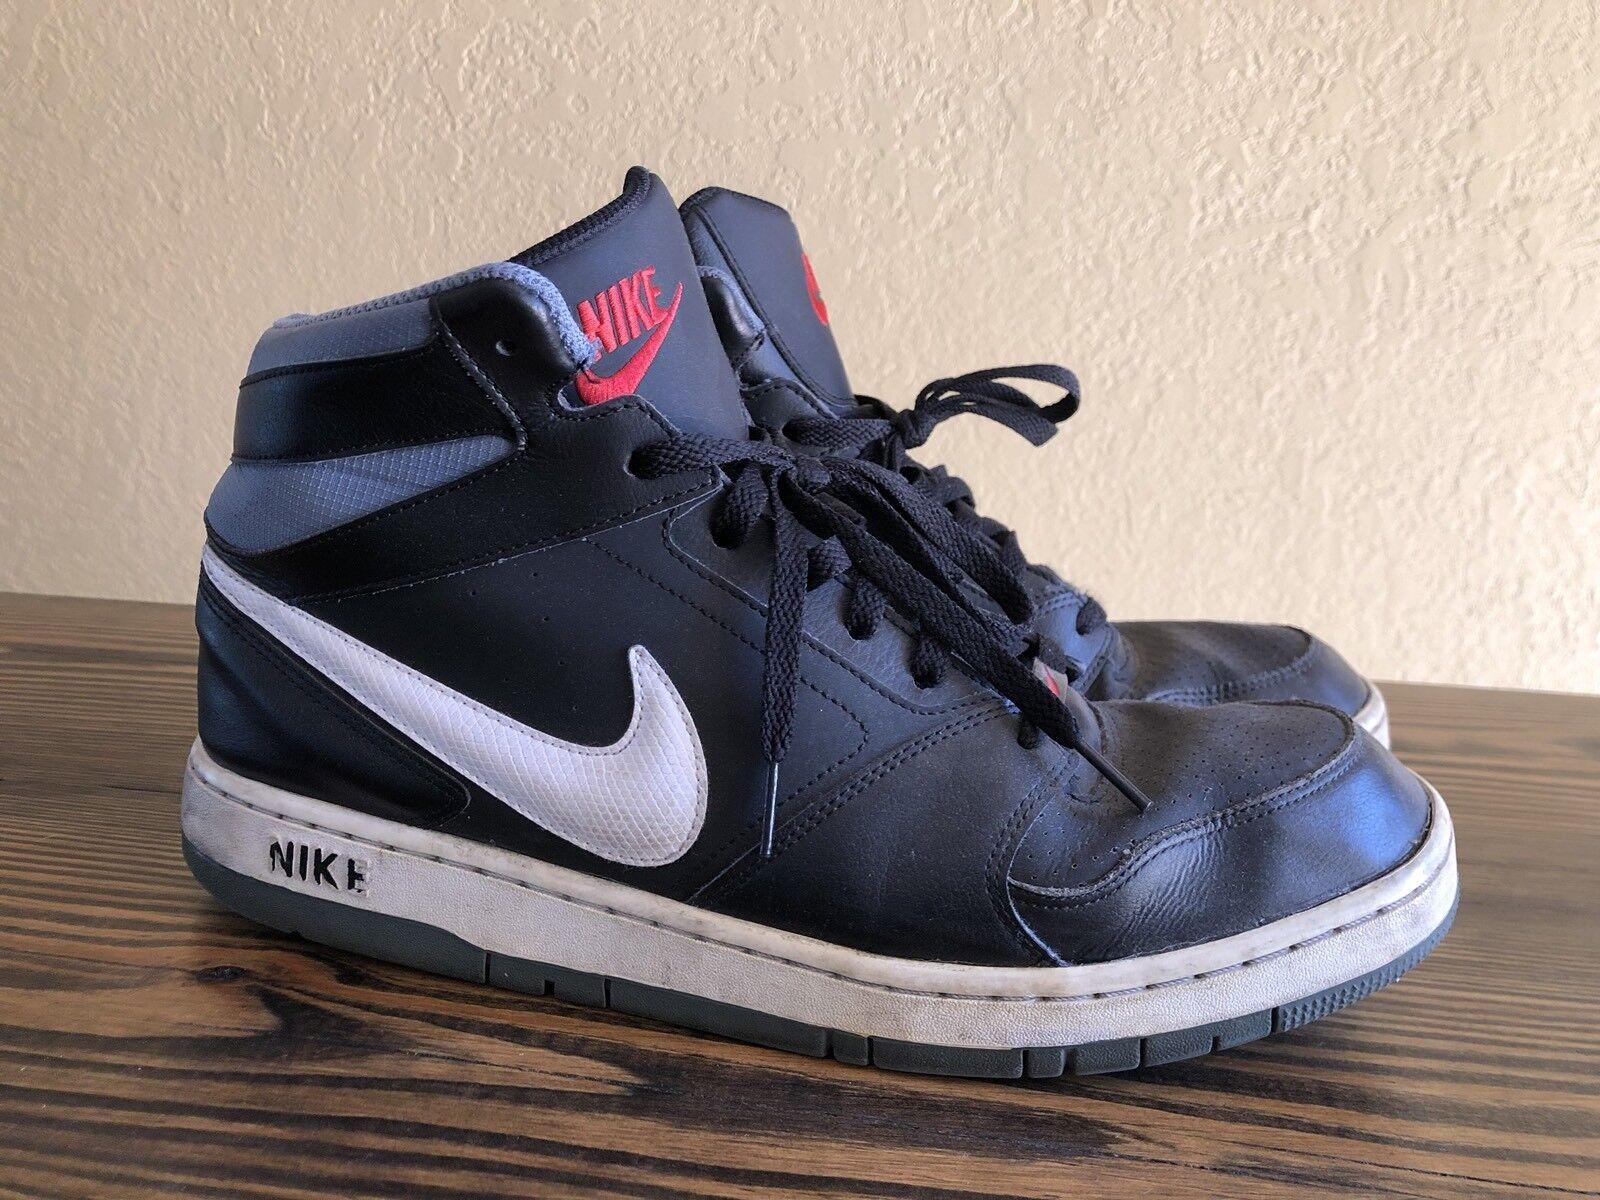 Nike Prestige IV High Men's 584614 014 Comfortable Cheap women's shoes women's shoes